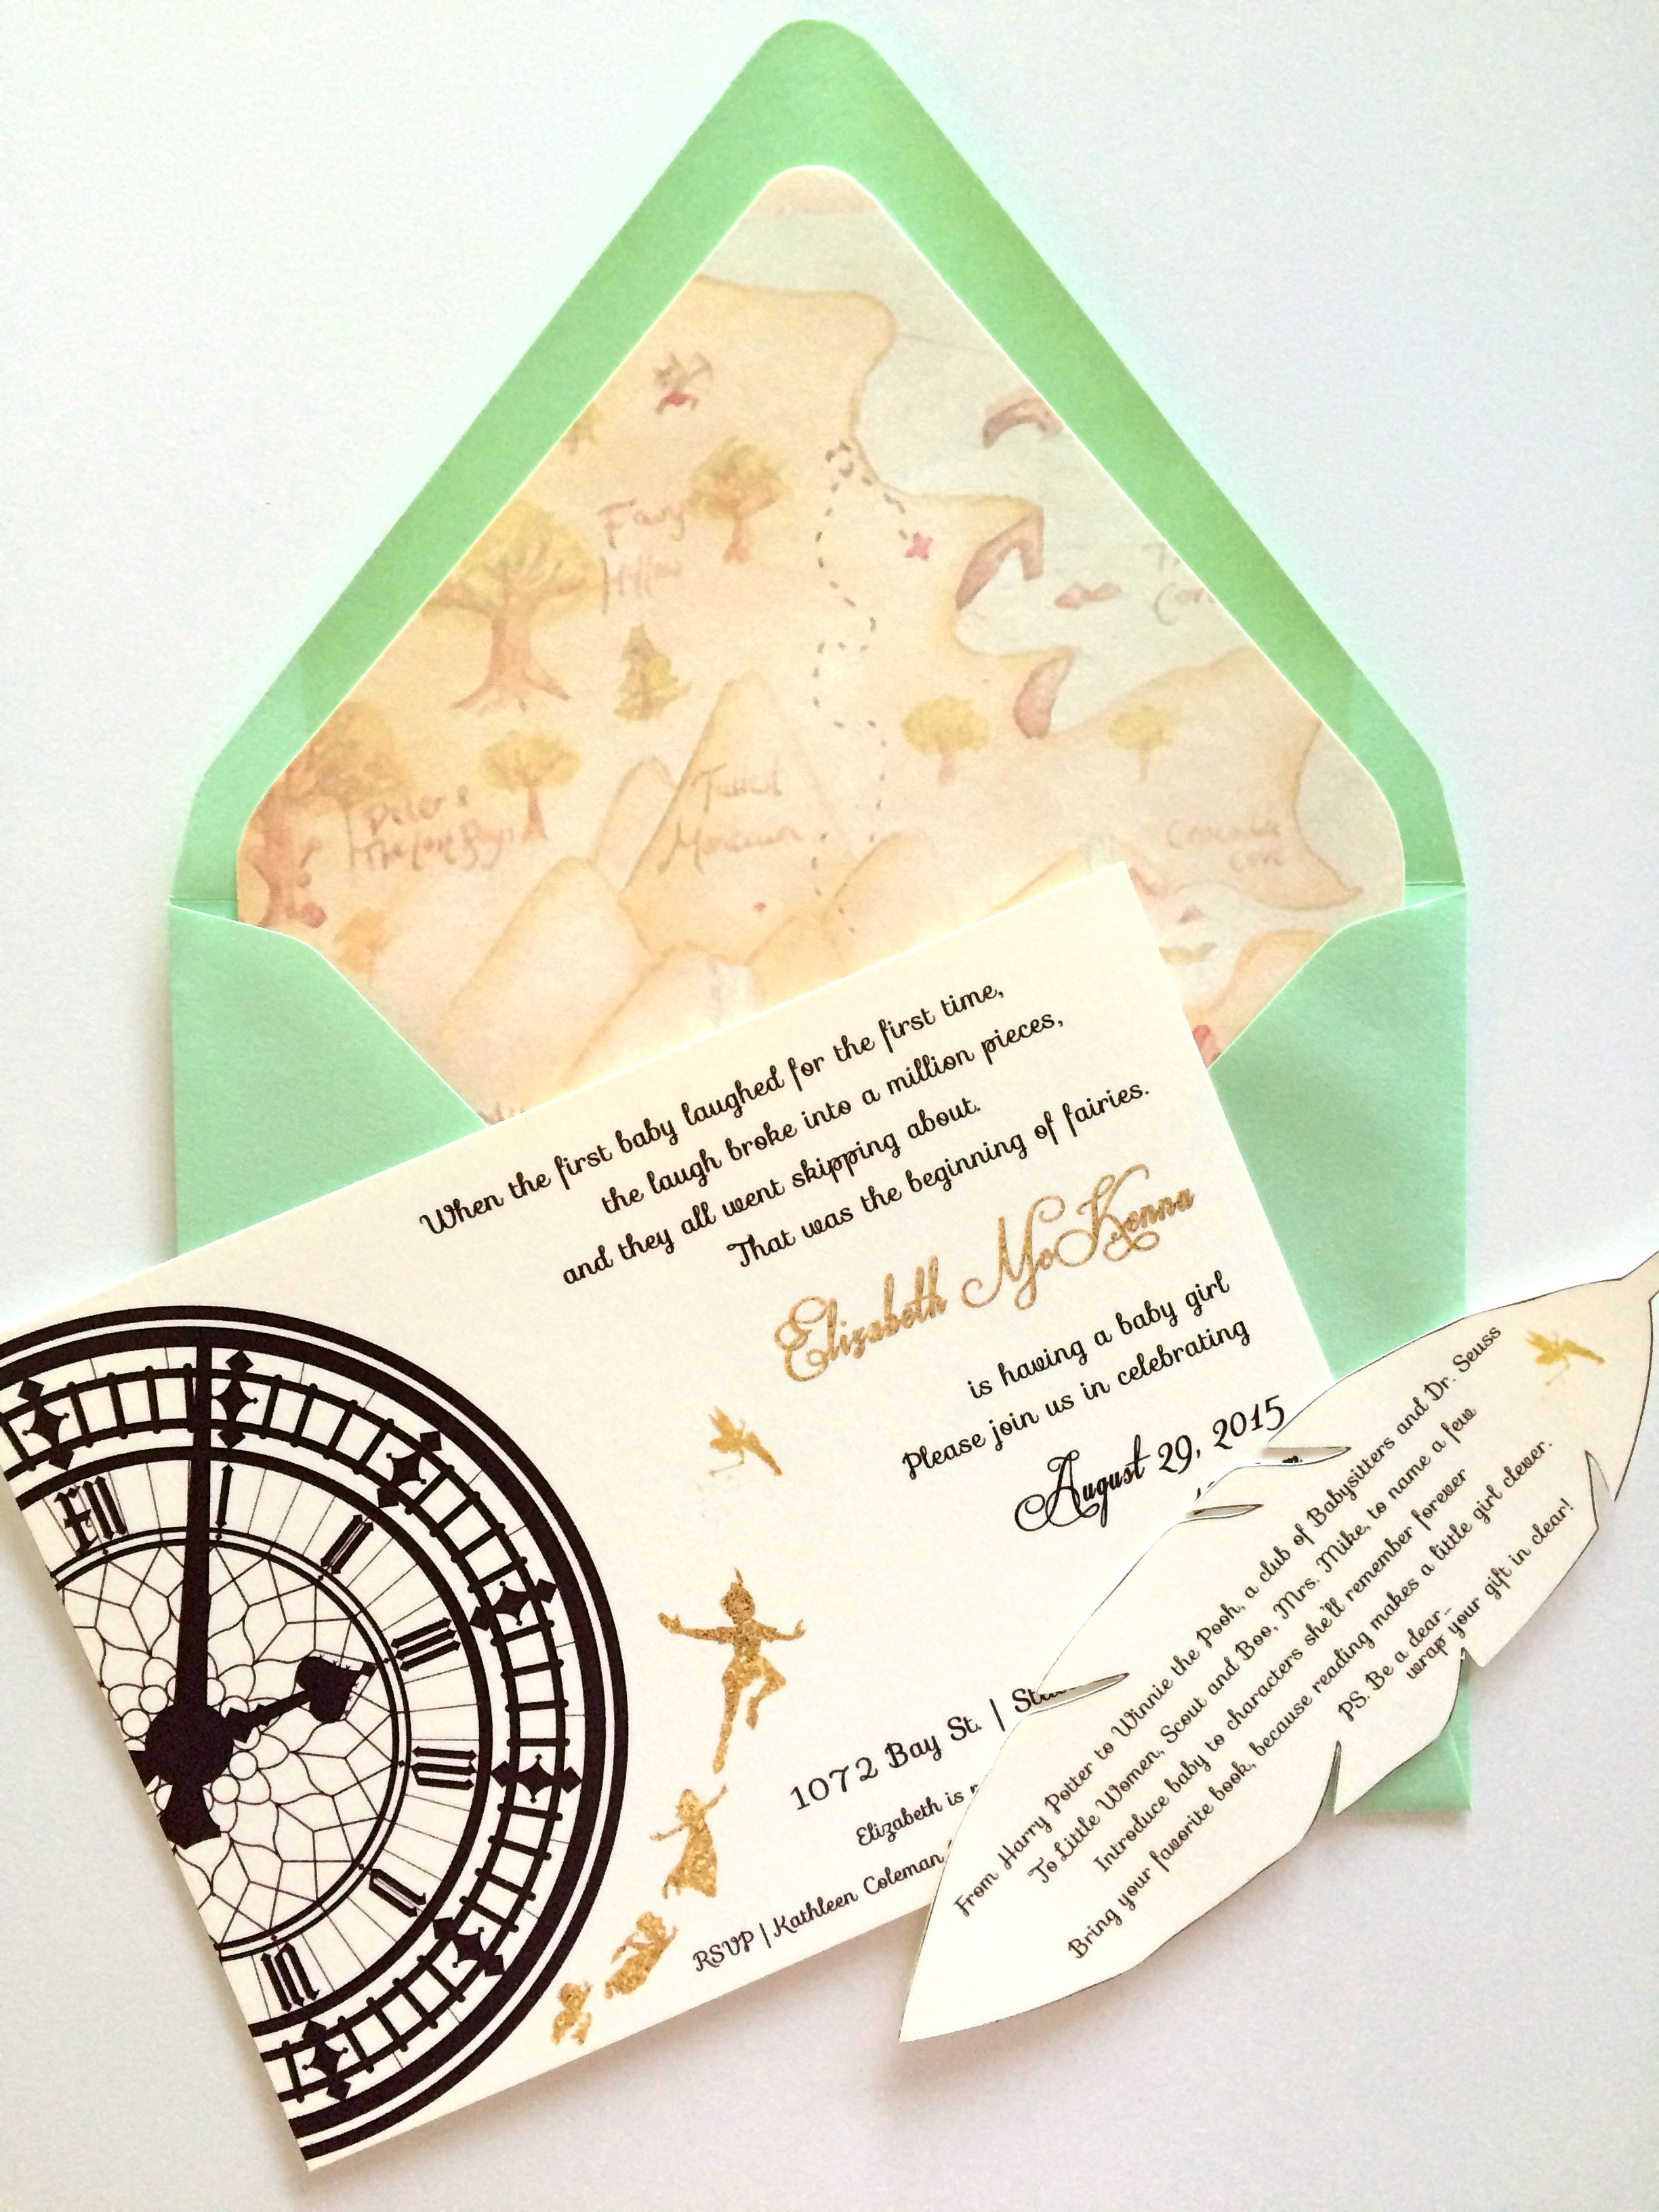 Peter Pan Baby Shower Invitatiobn | dpi designs | Pinterest | Peter ...